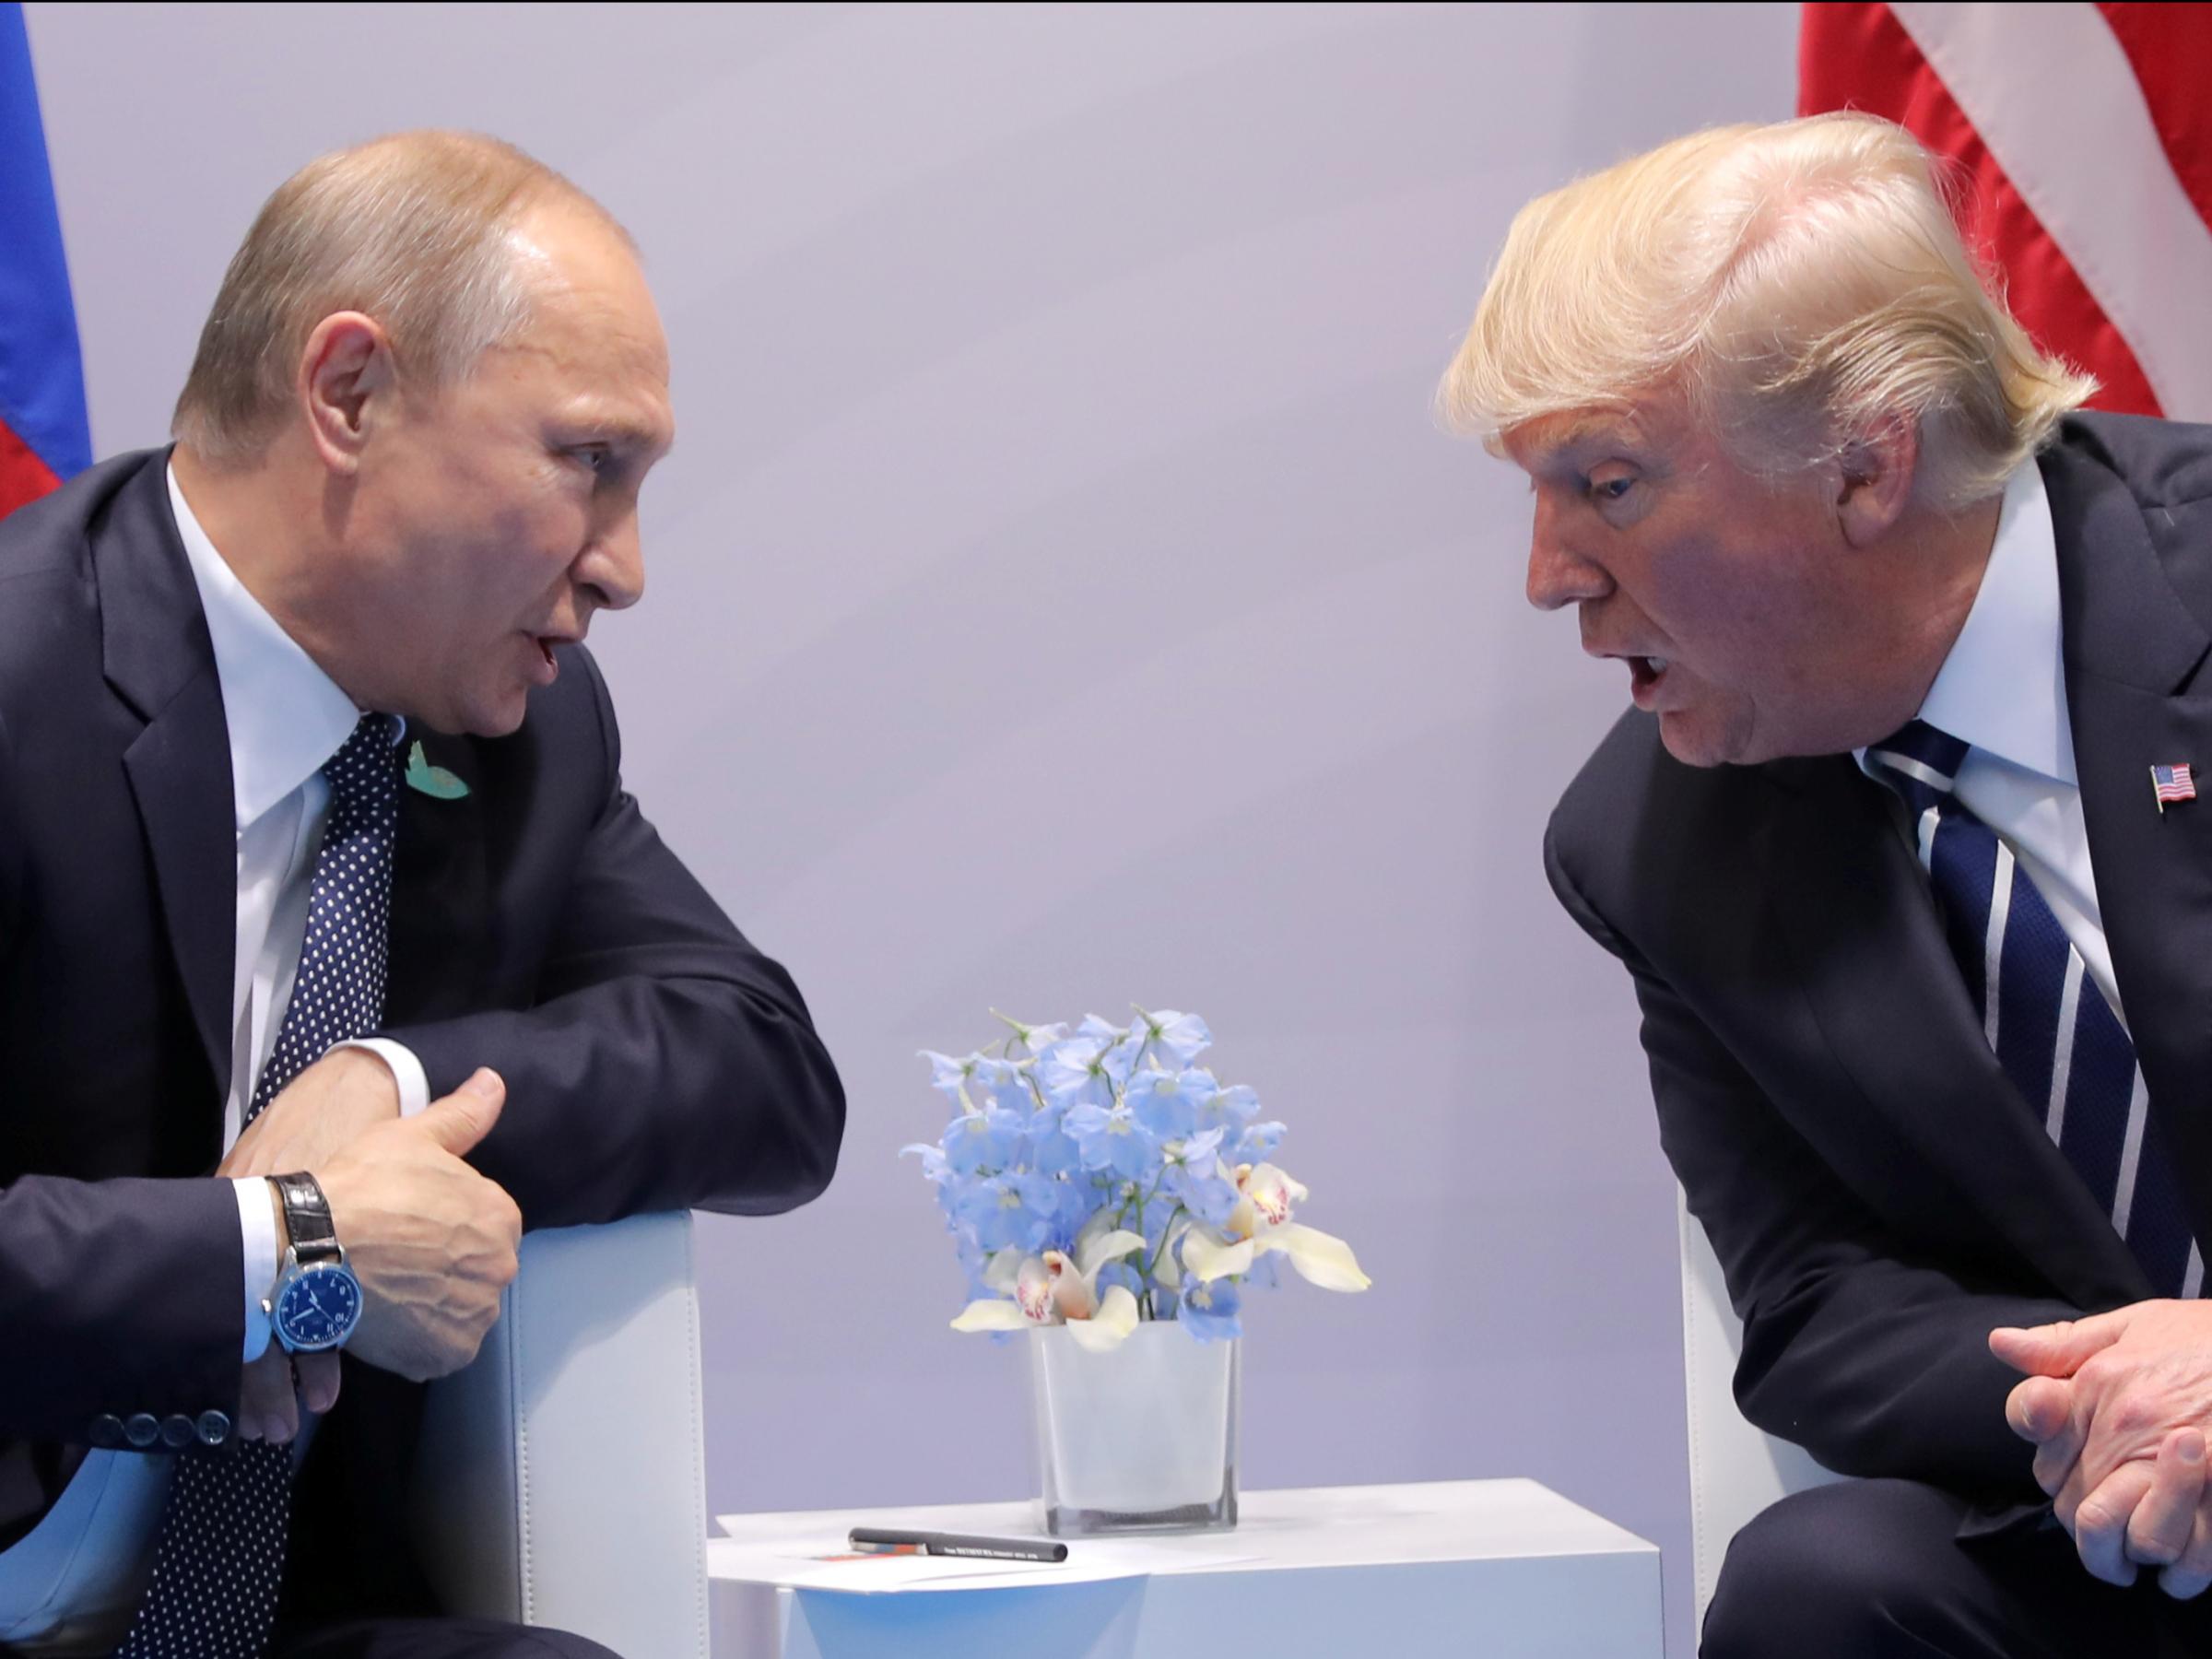 Vladimir Putin and Donald Trump at the G20 Summit. Credit:Carlos Barria/Reuters